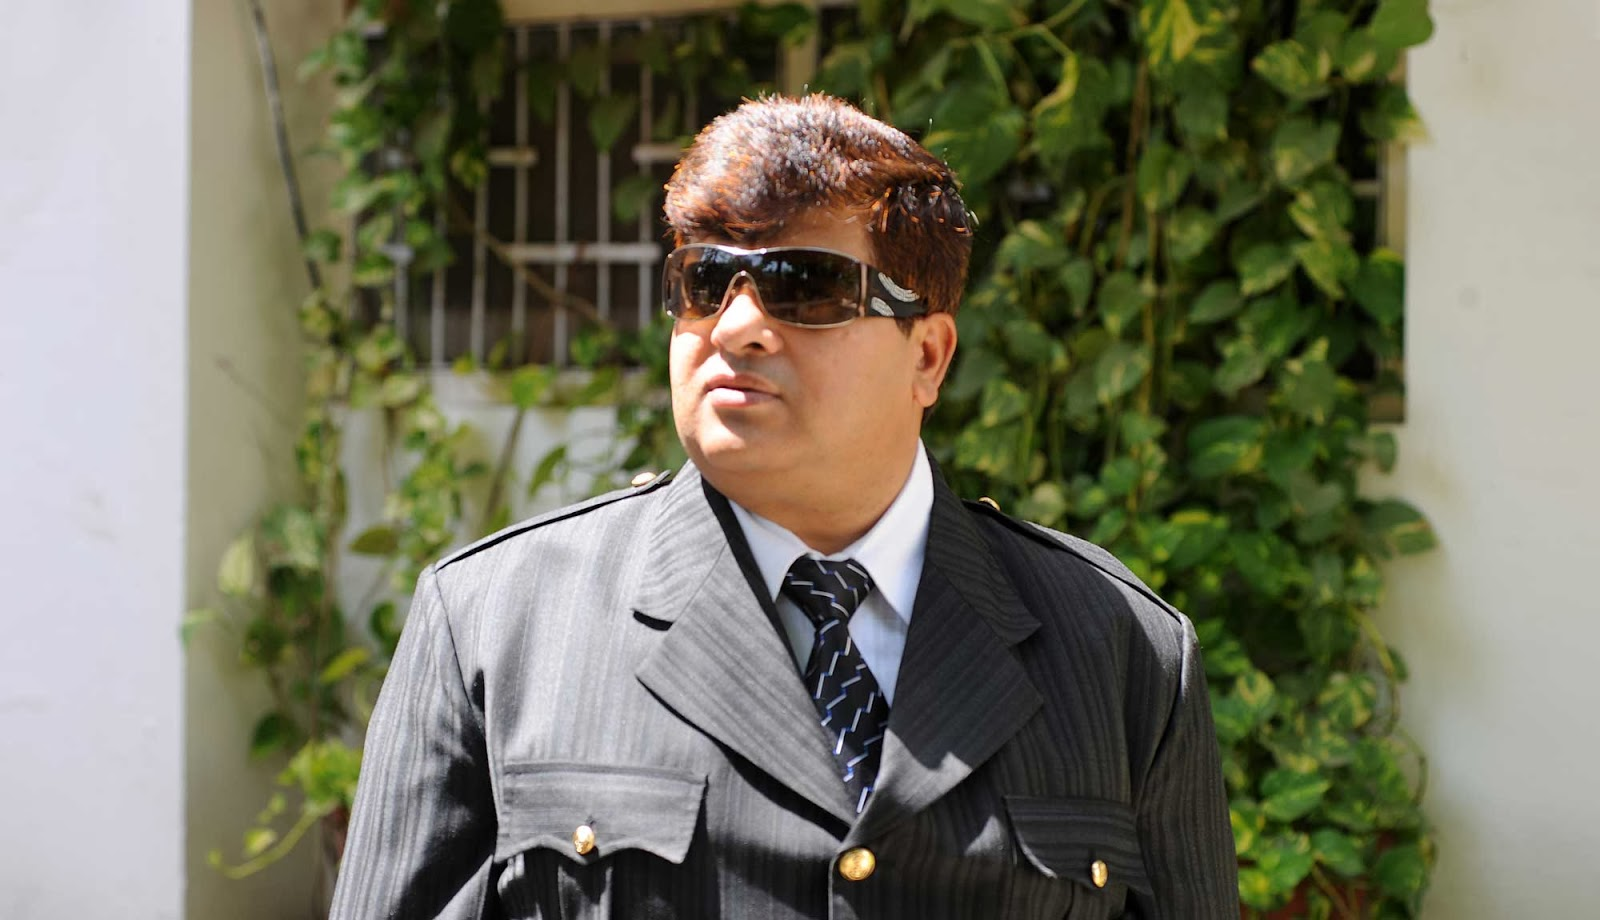 Dr. Pradeep Kumawat Udaipur, Rajasthan, India